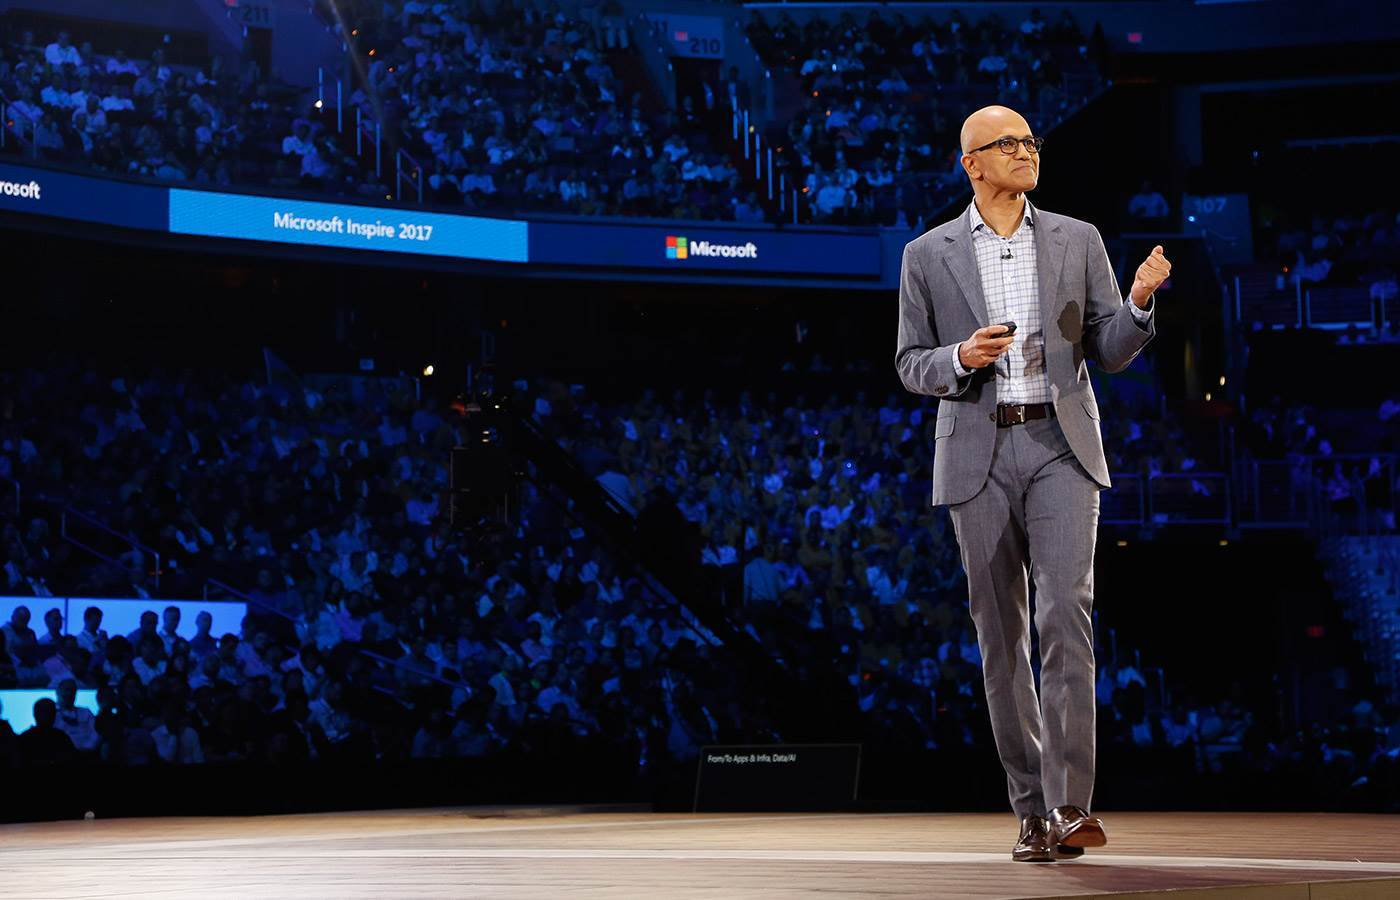 Microsoft Names Telstra Melbourne It Datacom And Dxc Among Worlds